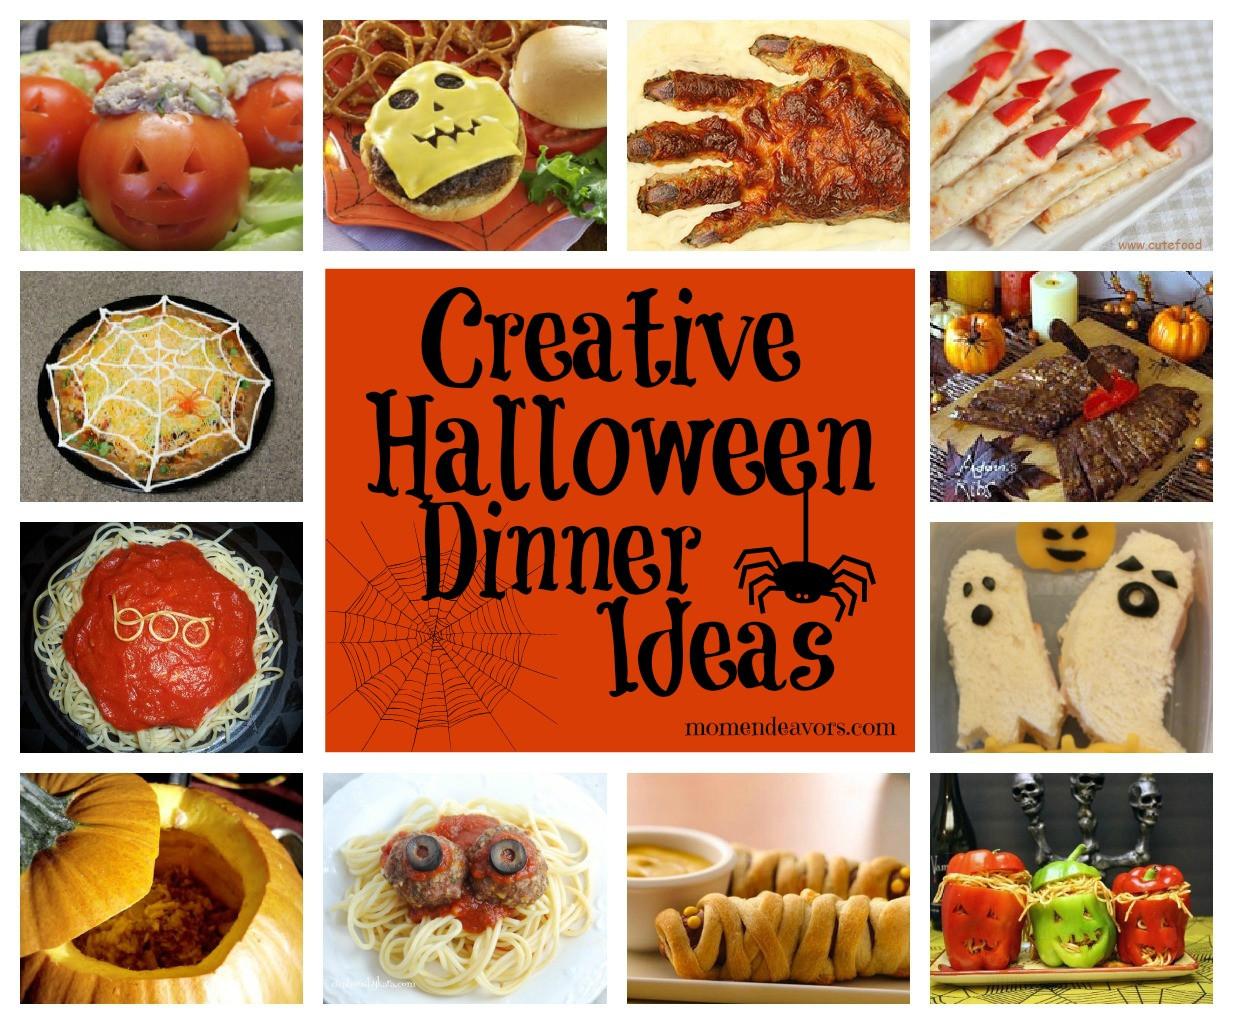 Halloween Dinner Ideas  15 Creative Halloween Dinner Ideas